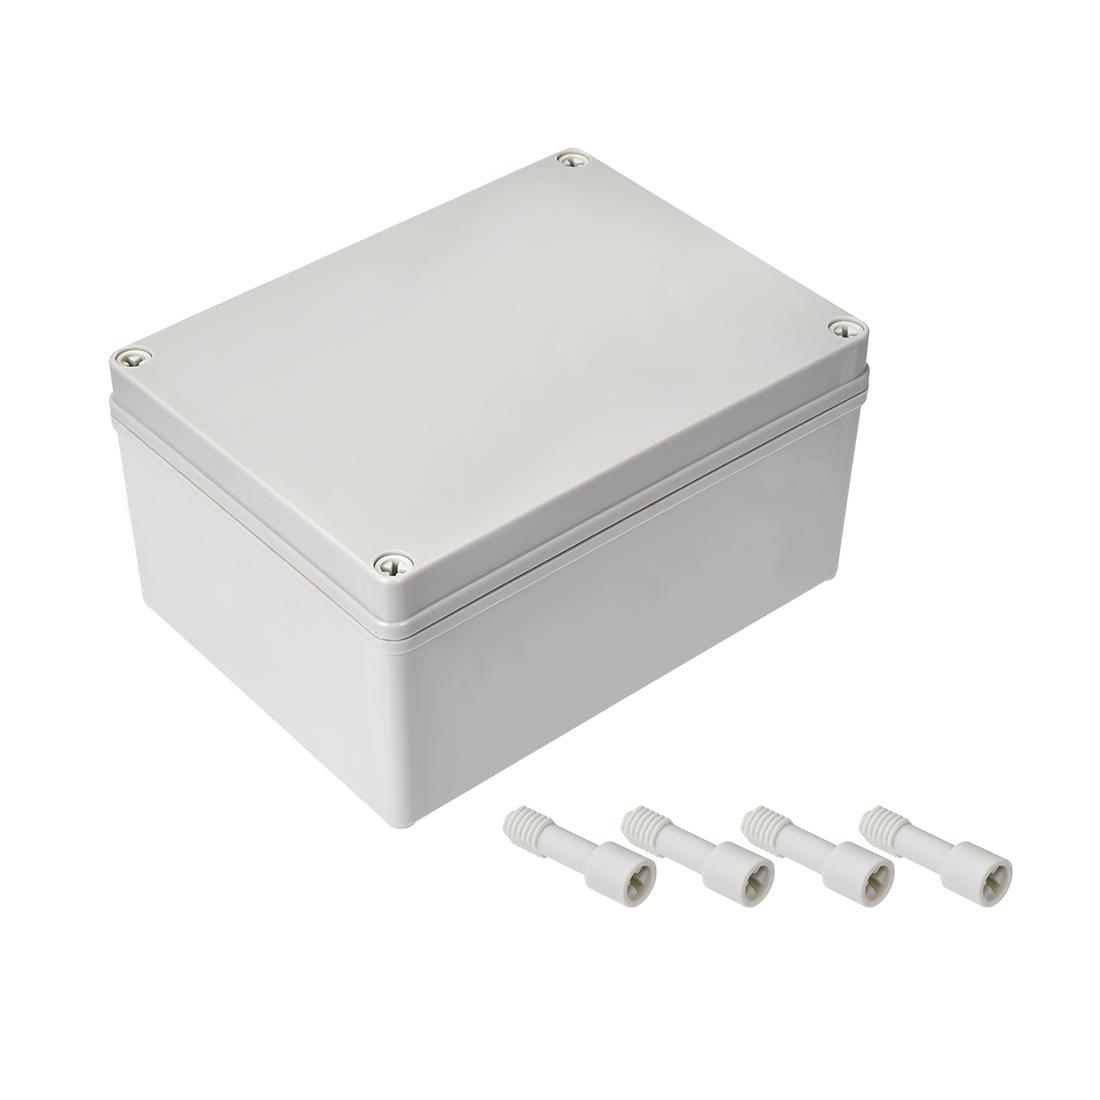 200mm x 150mm x 100mm Dustproof IP65 Junction Box DIY Case Enclosure Gray